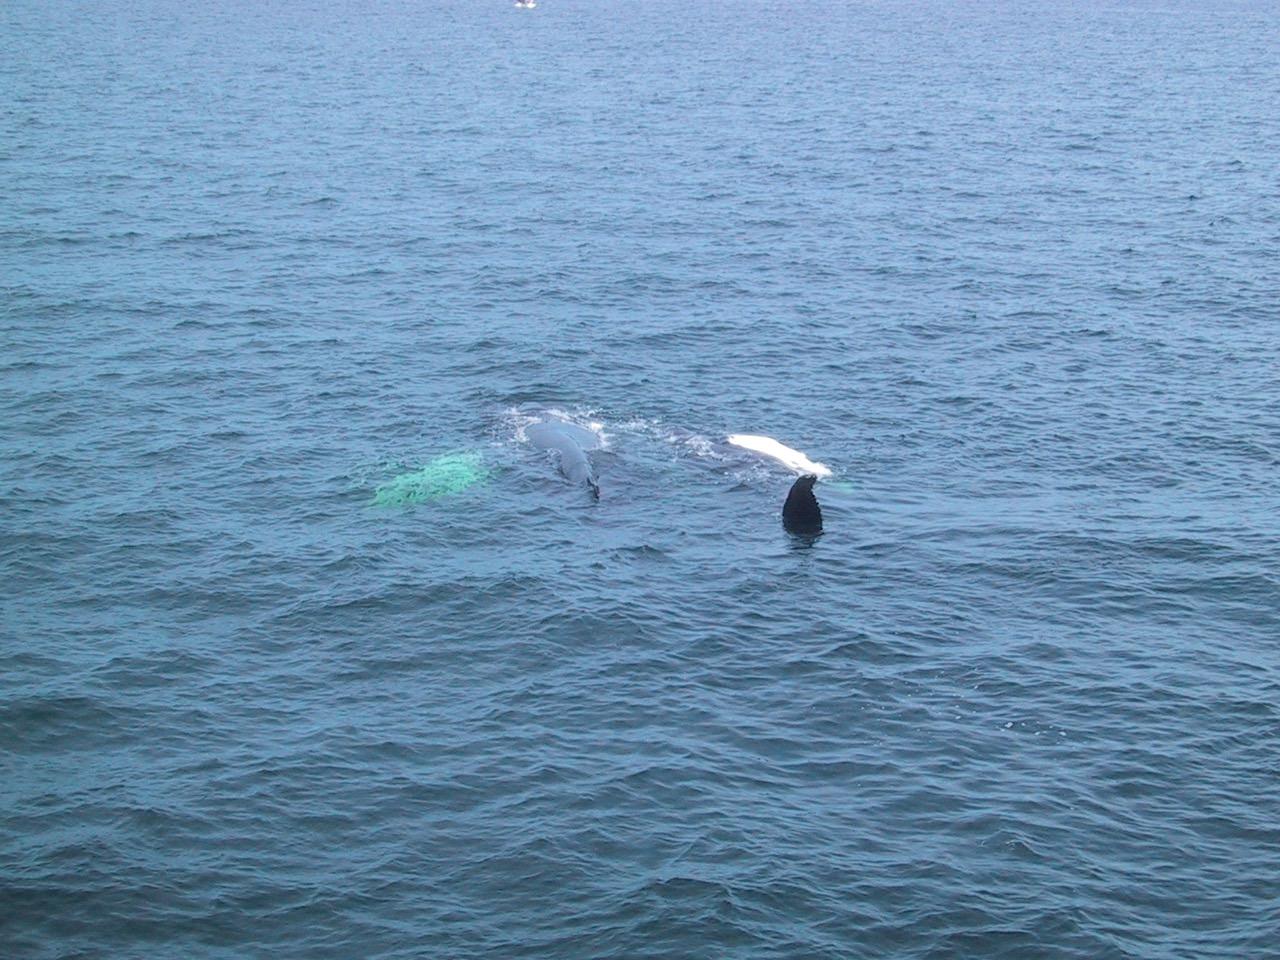 stellwagen-humpbacks-keith-salvesen-3